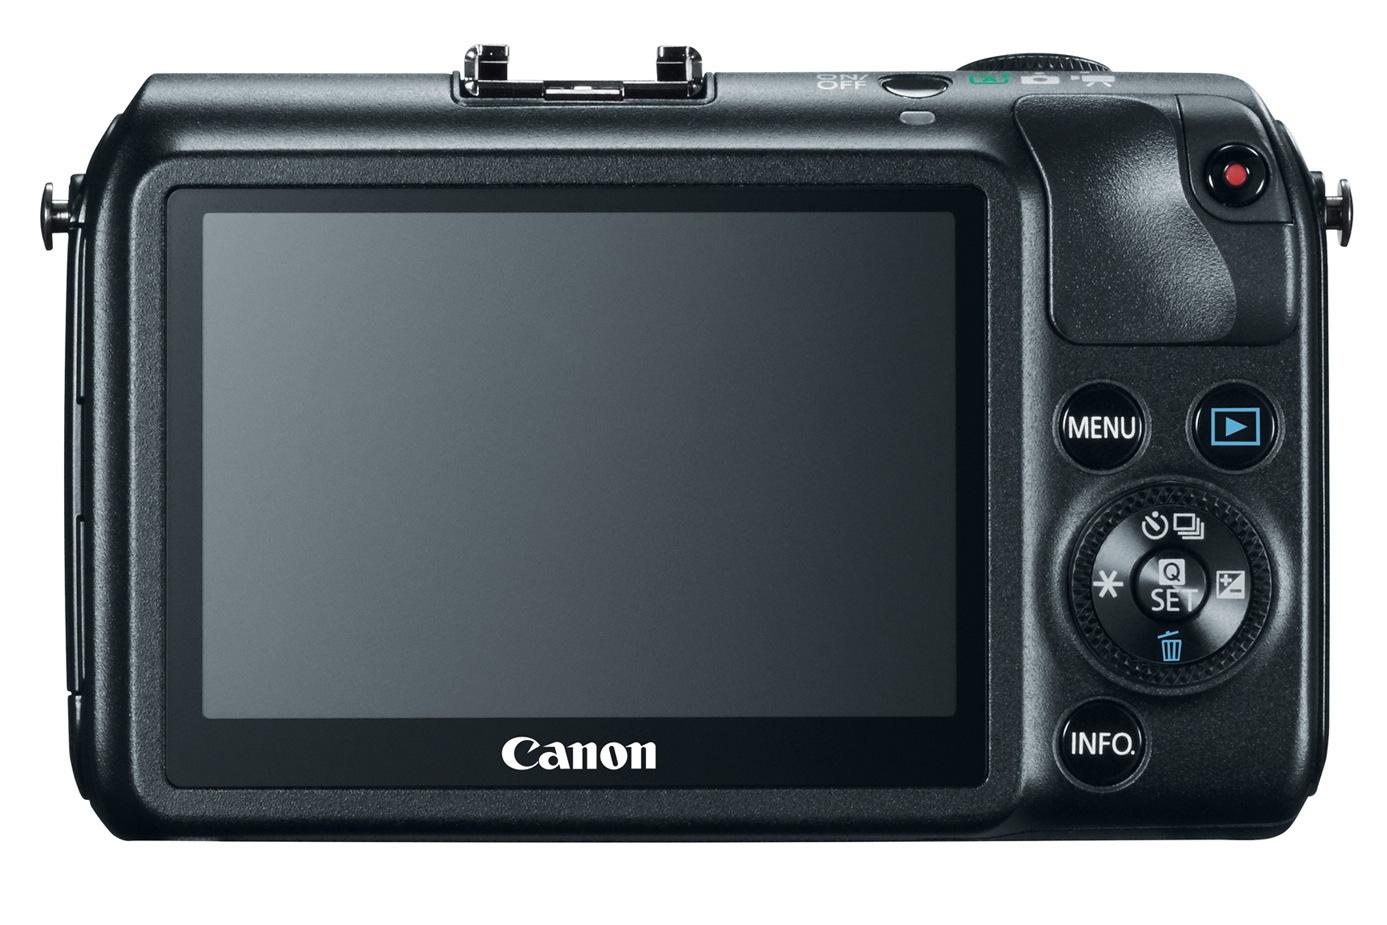 изображение с фотоаппарата на монитор одной